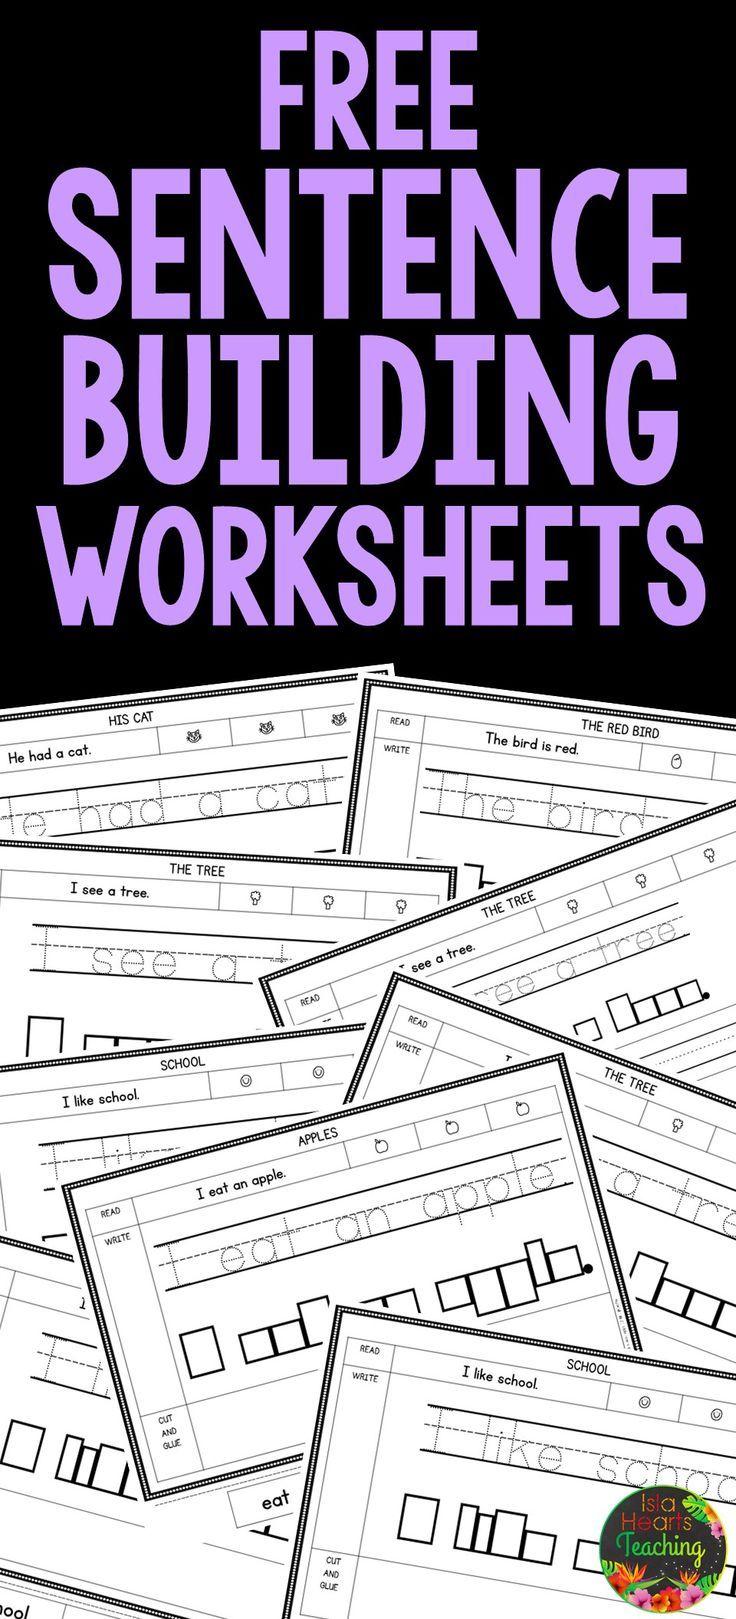 Sentence Building Worksheets (FREE) Sentence building